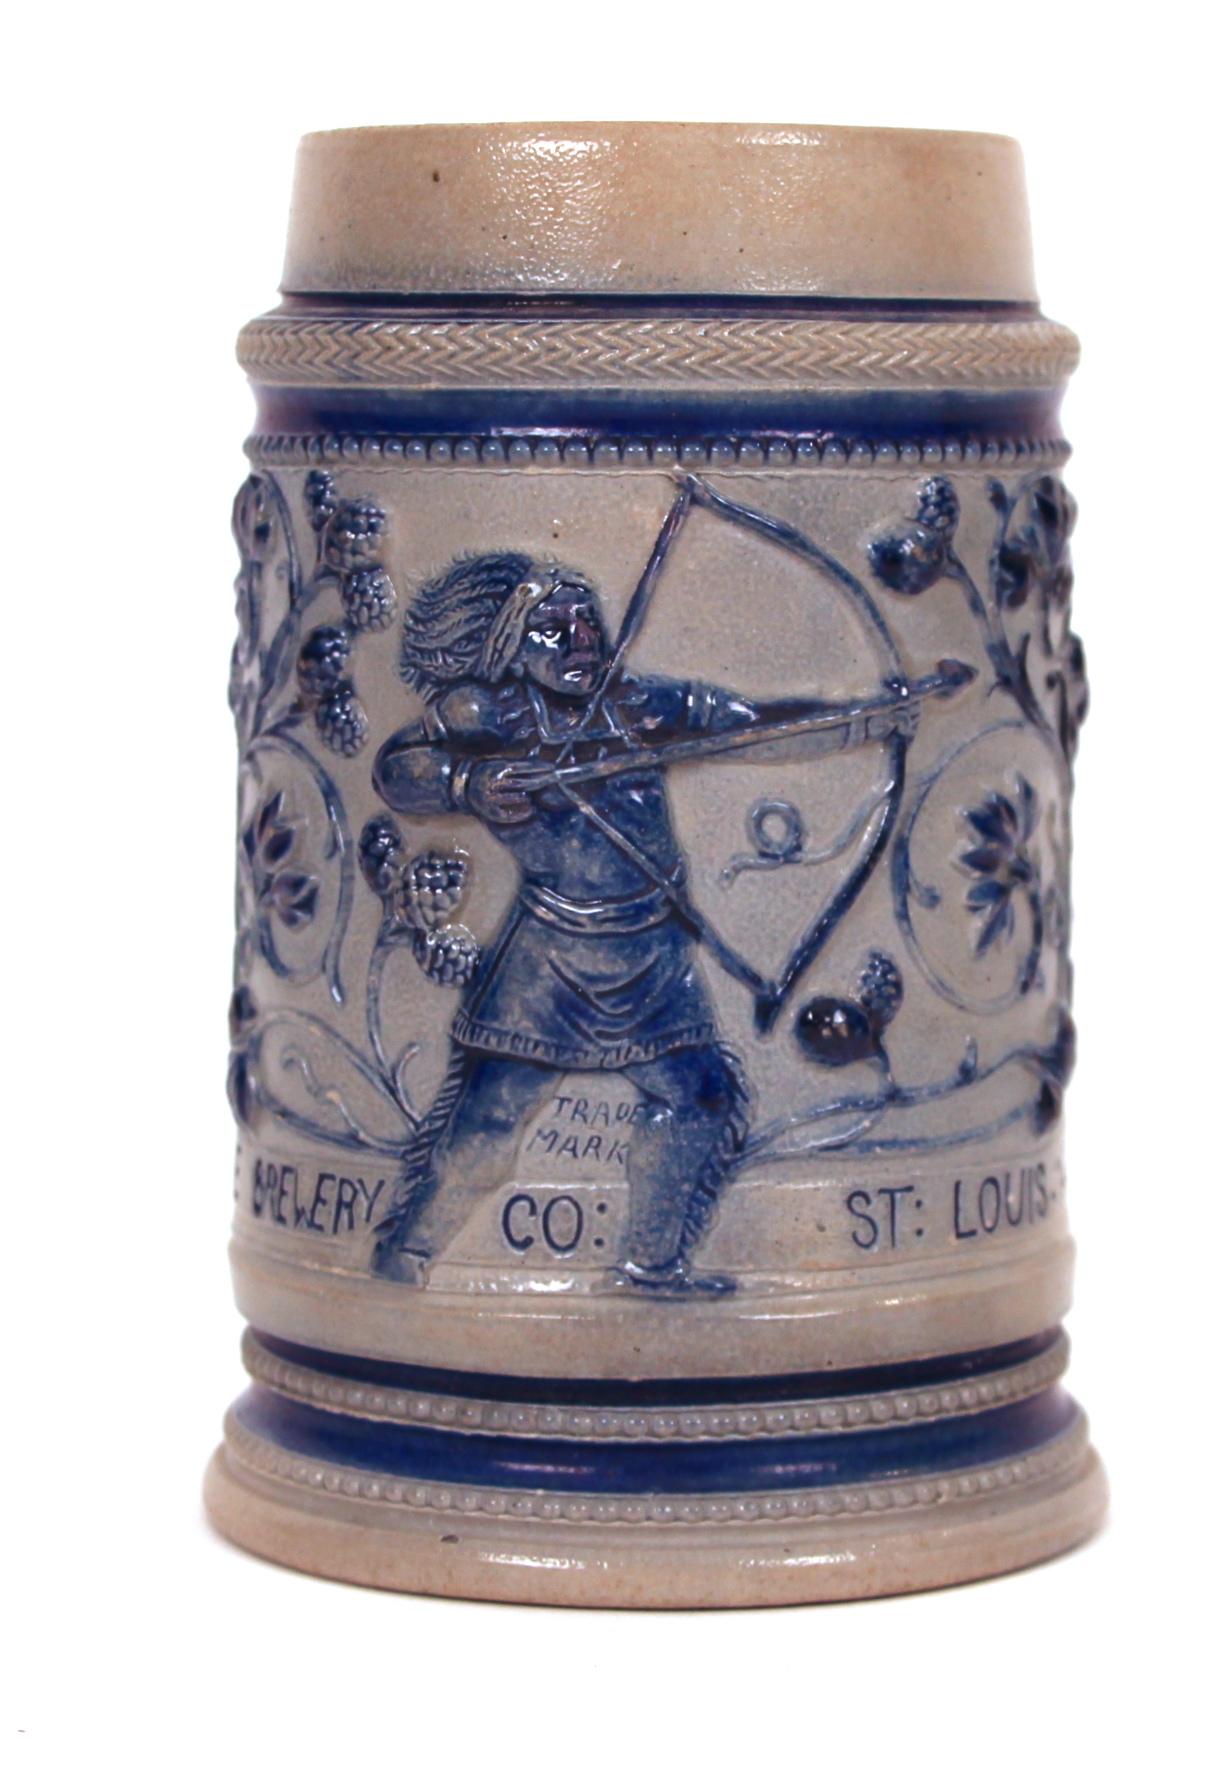 Cherokee Brewery Salt-Glazed Beer Stein 1890 St. Louis, MO